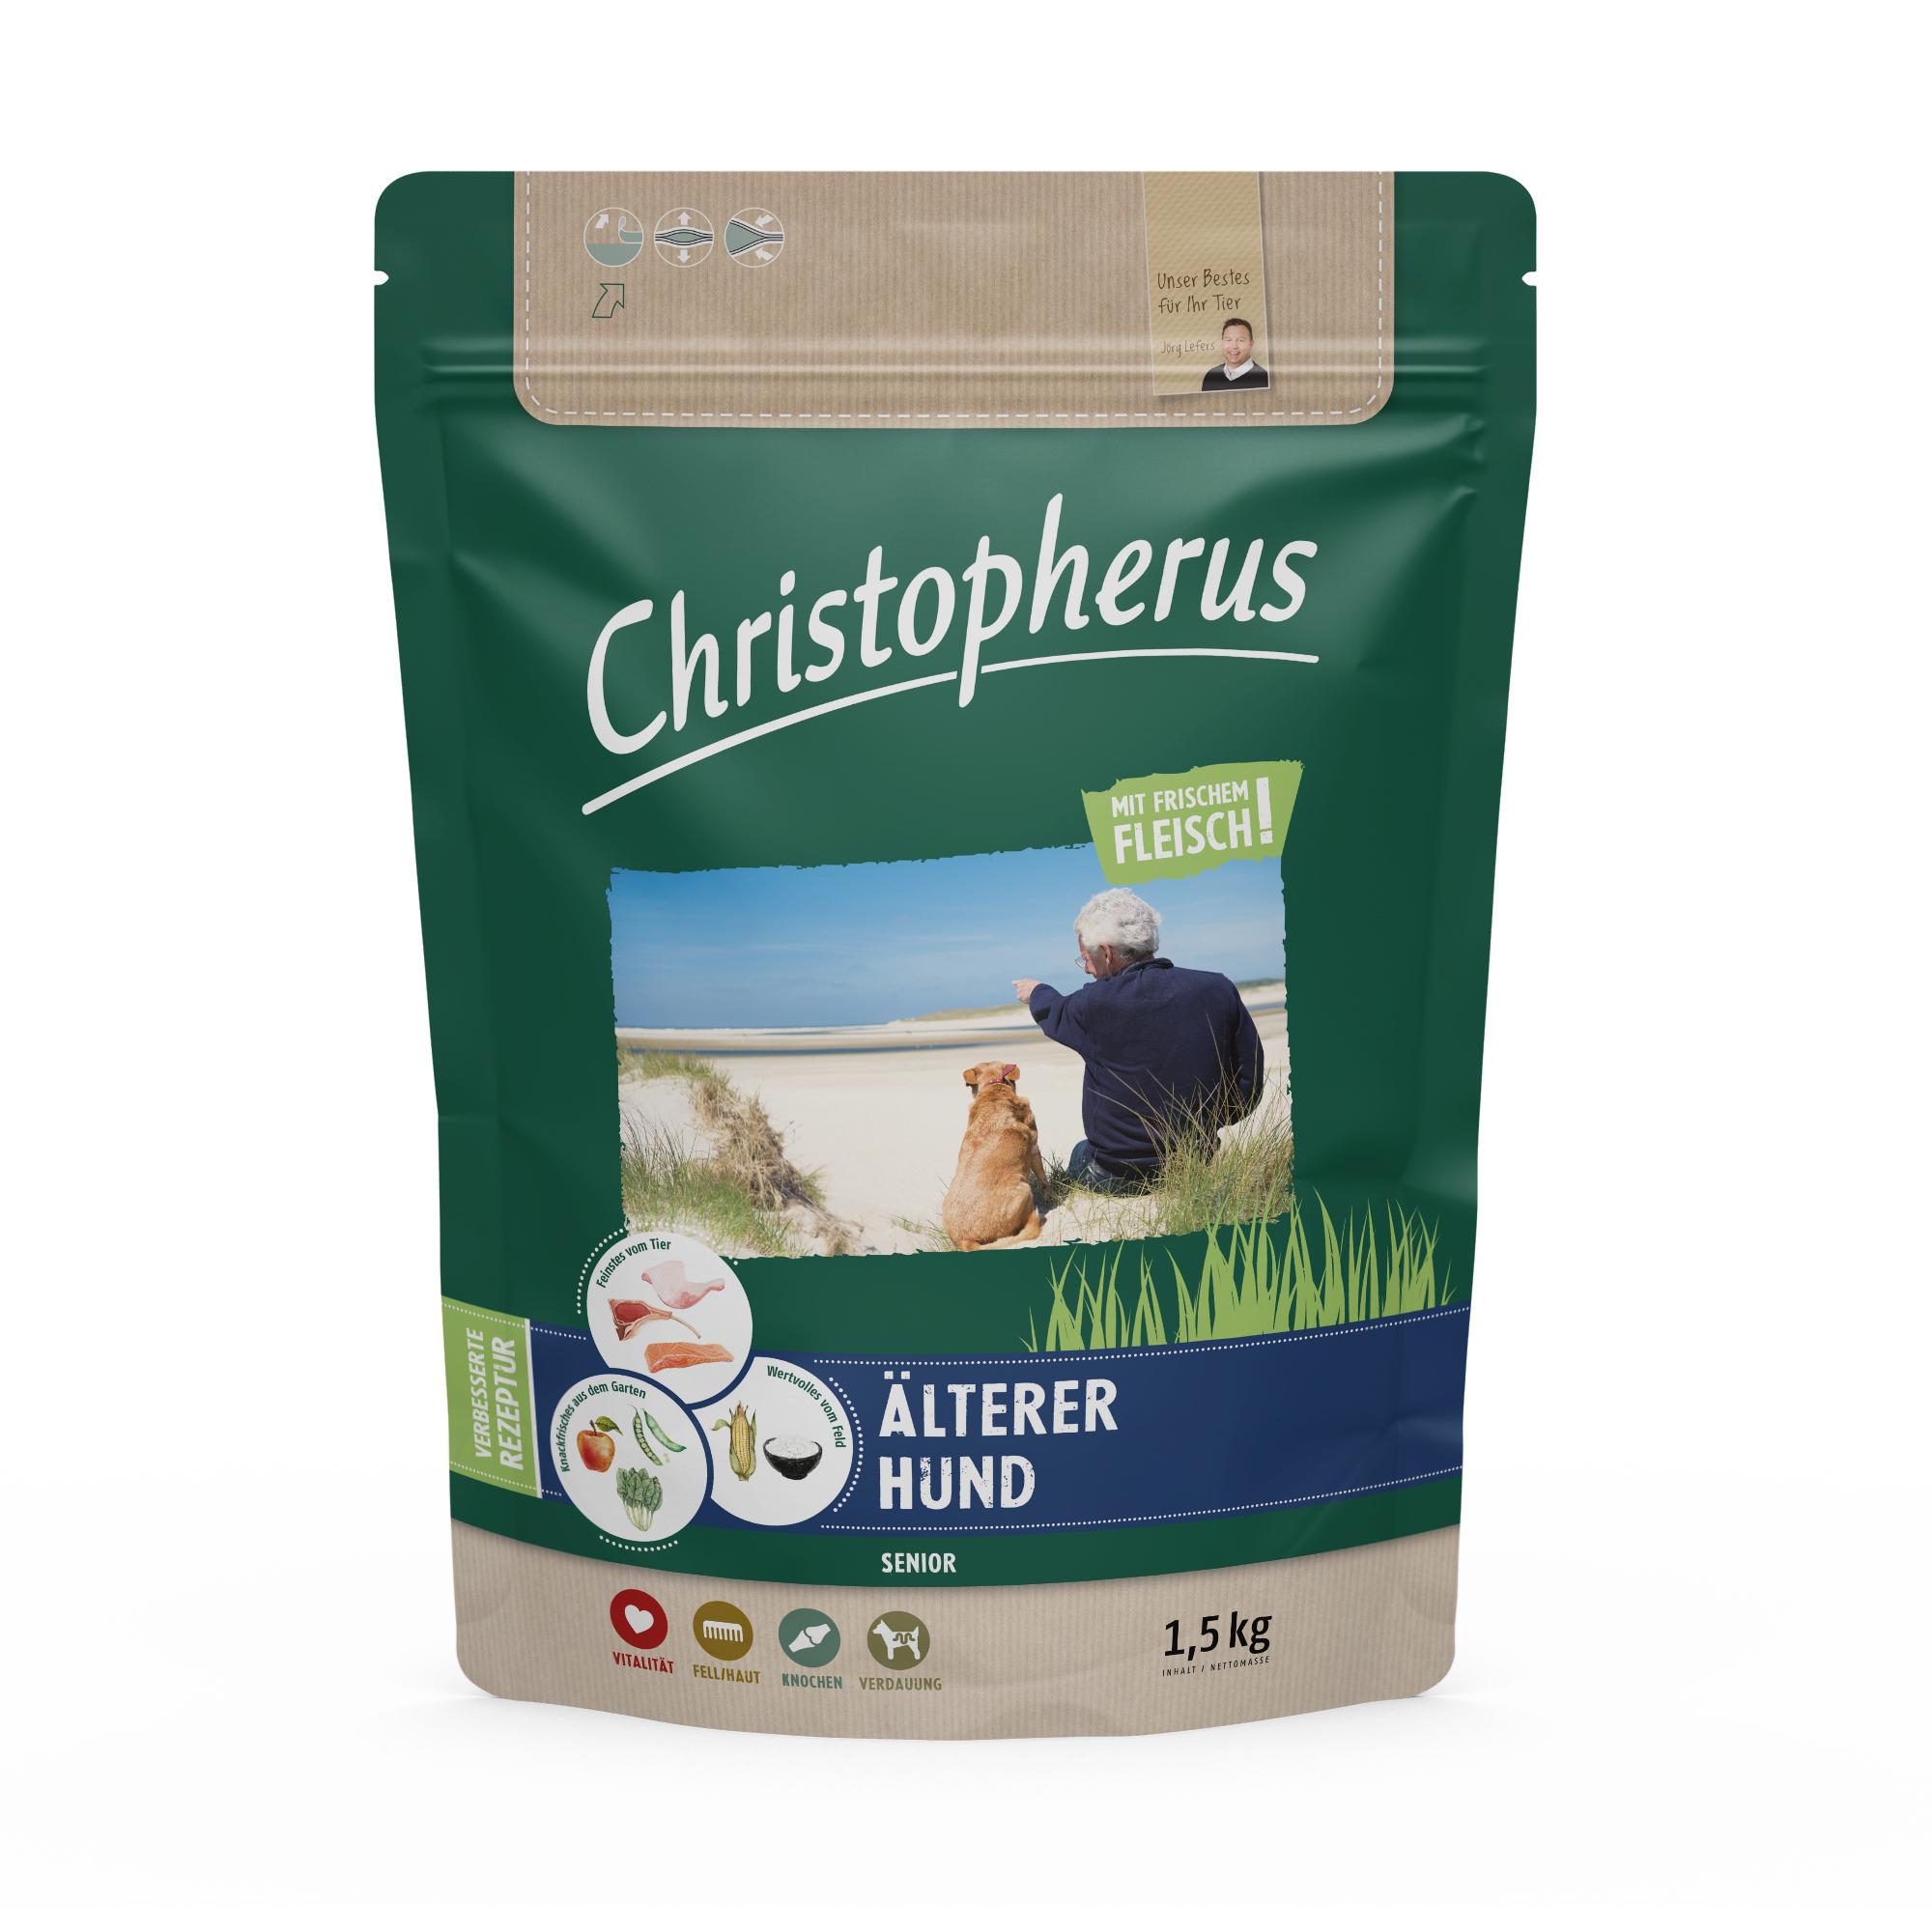 Christopherus – Älterer Hund